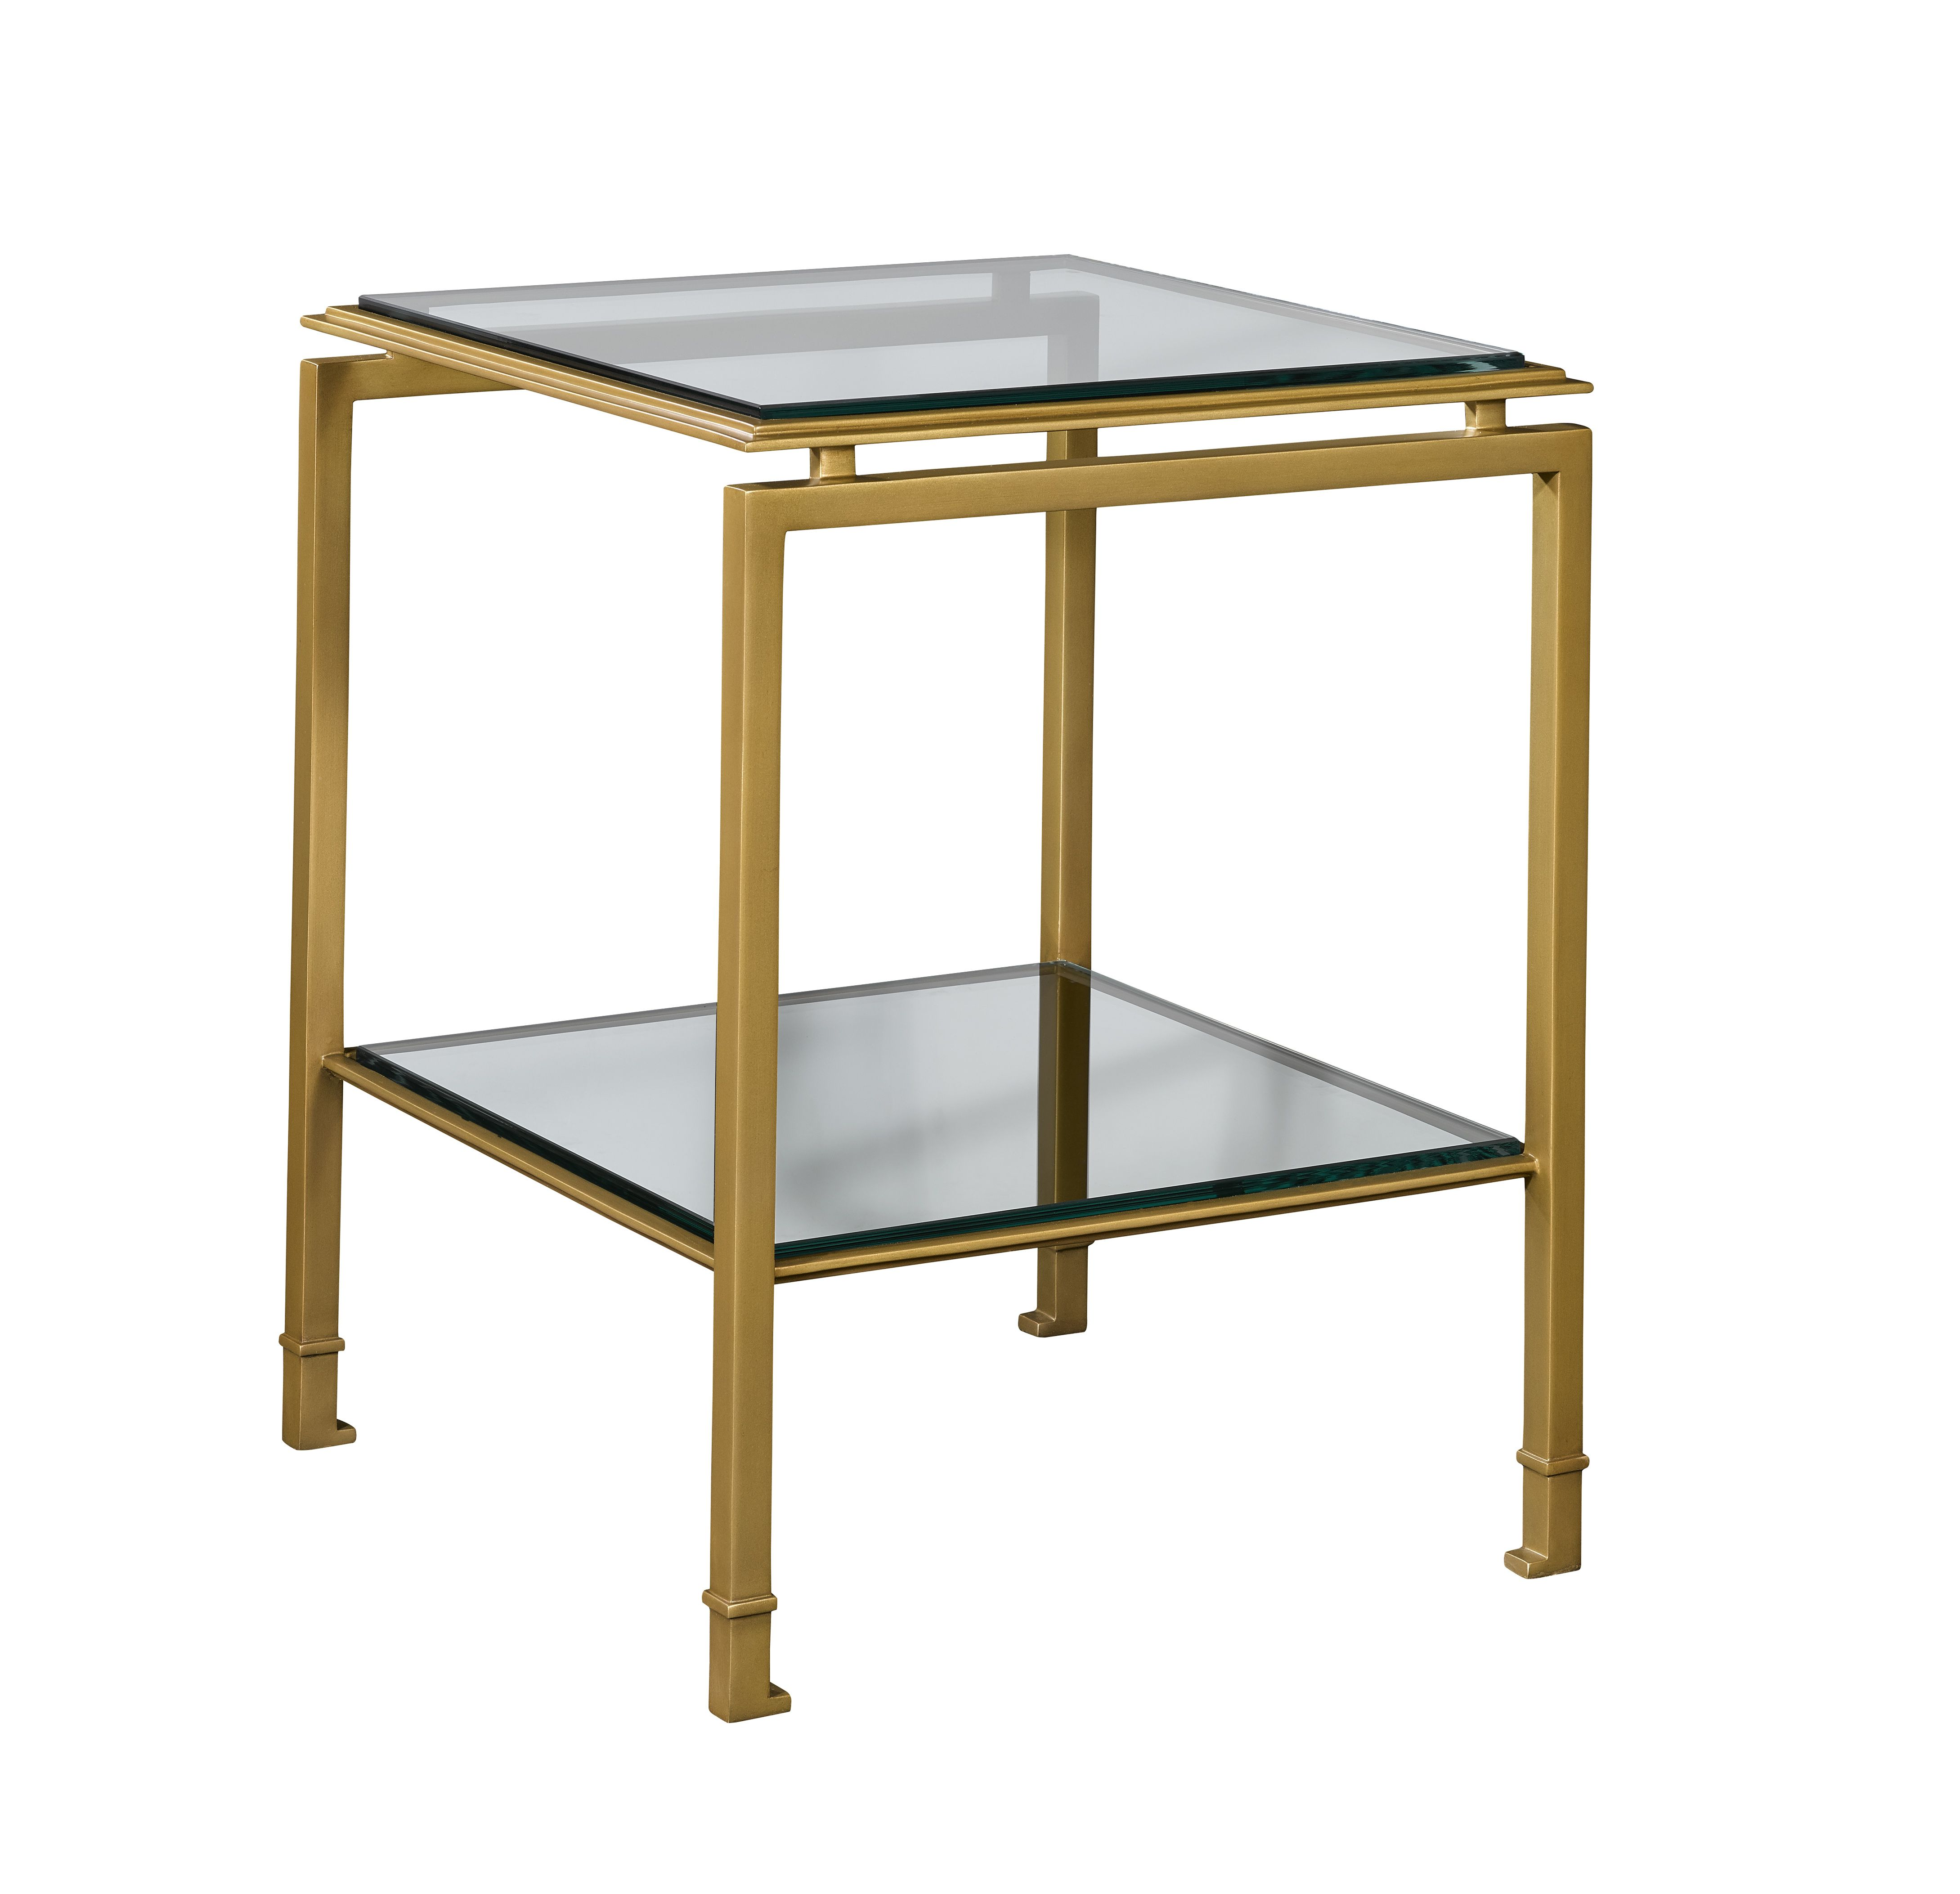 Montpelier Side Table Suzanne Kasler Paris Collection 2018